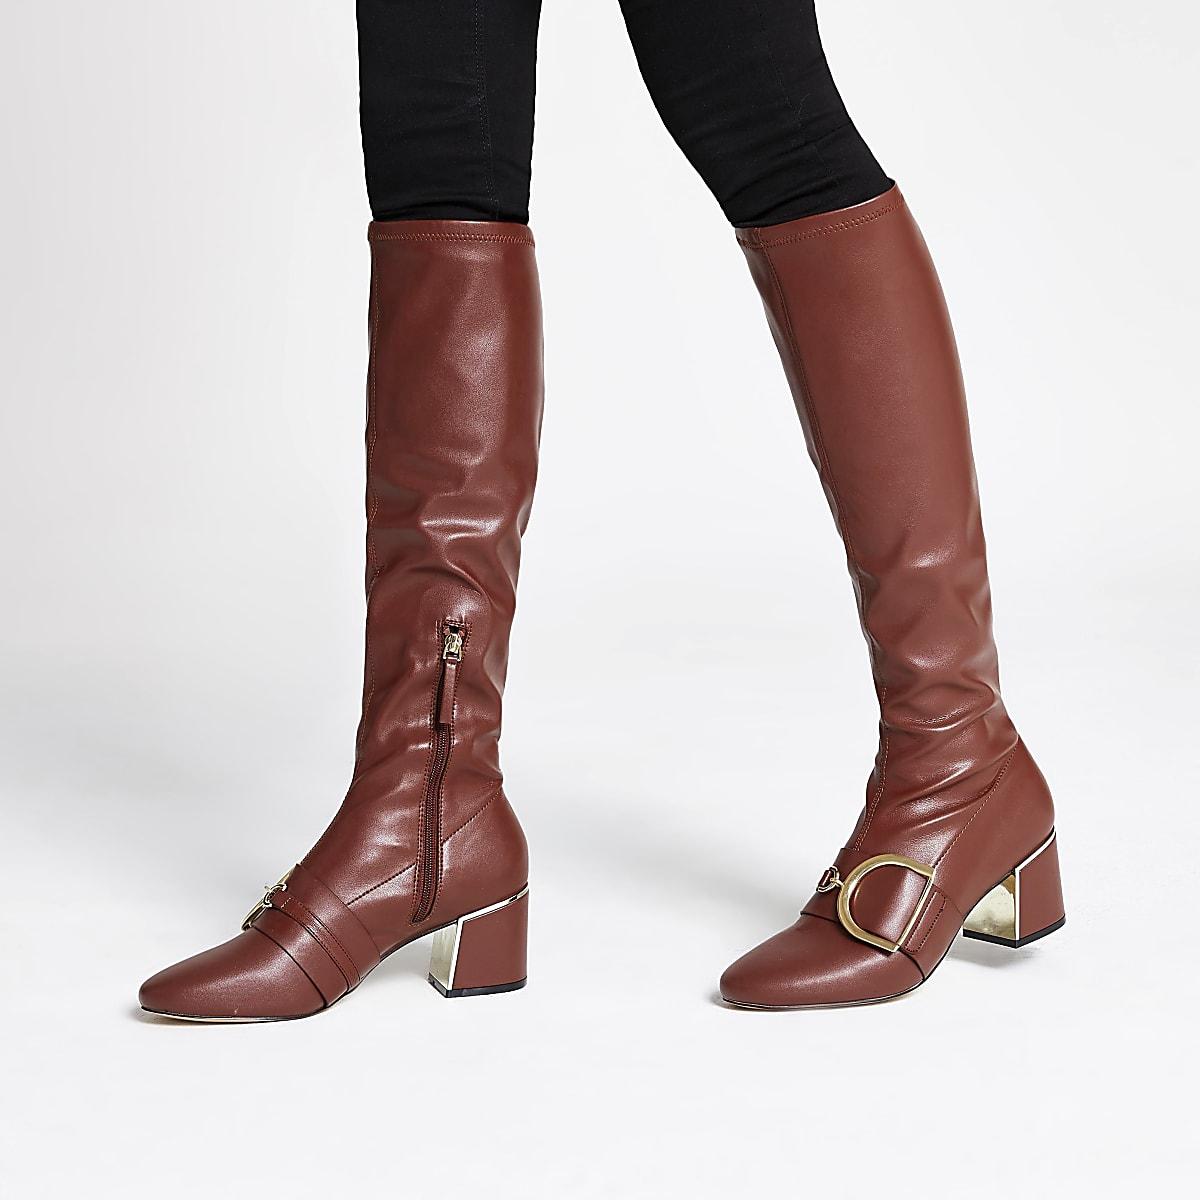 premium selection 383ae bfa9a Burgundy knee high boots